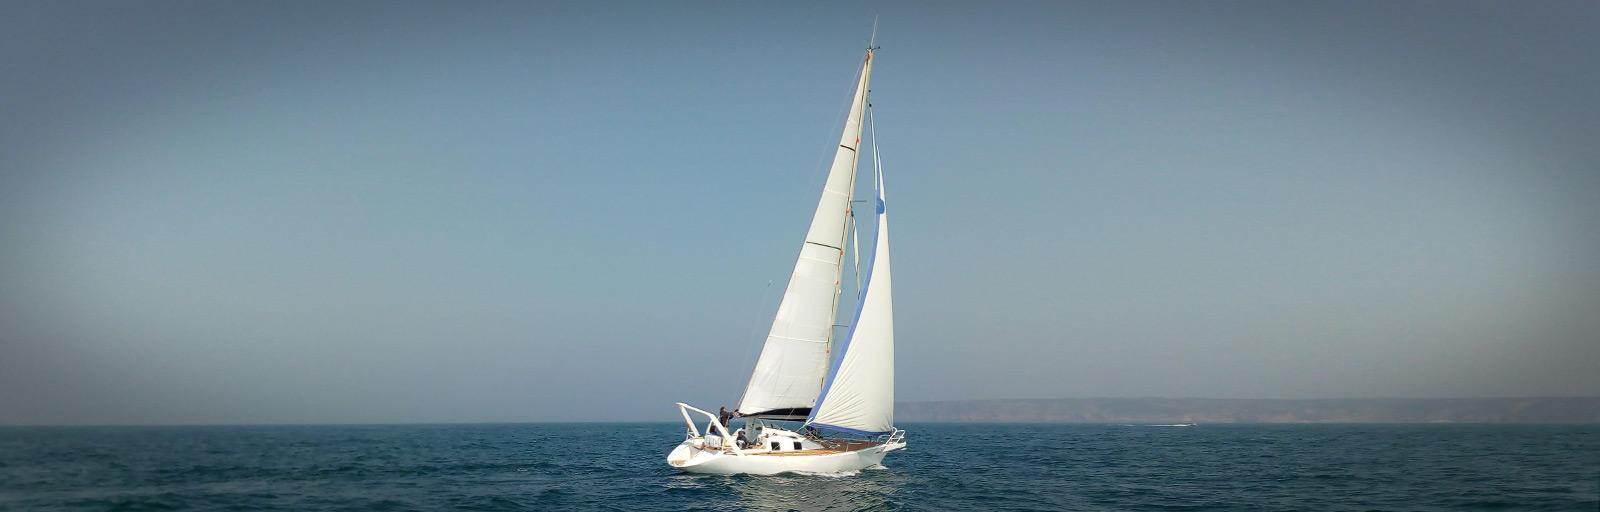 Morning Glory 36 - Dériveur lesté Aluminium AYC Yachtbroker